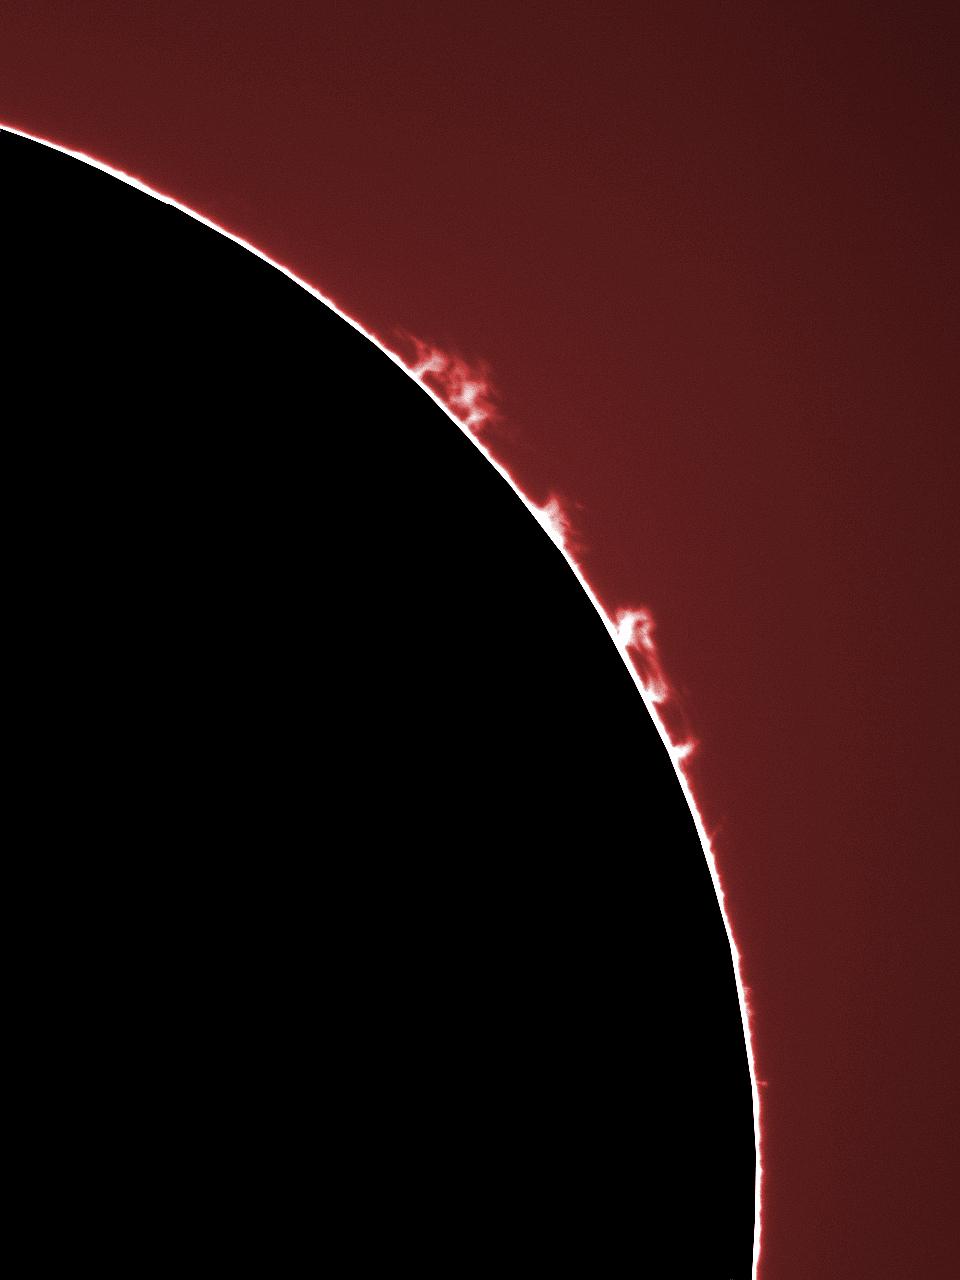 Sonneaufnahme mit Lunt-Sonnenteleskop